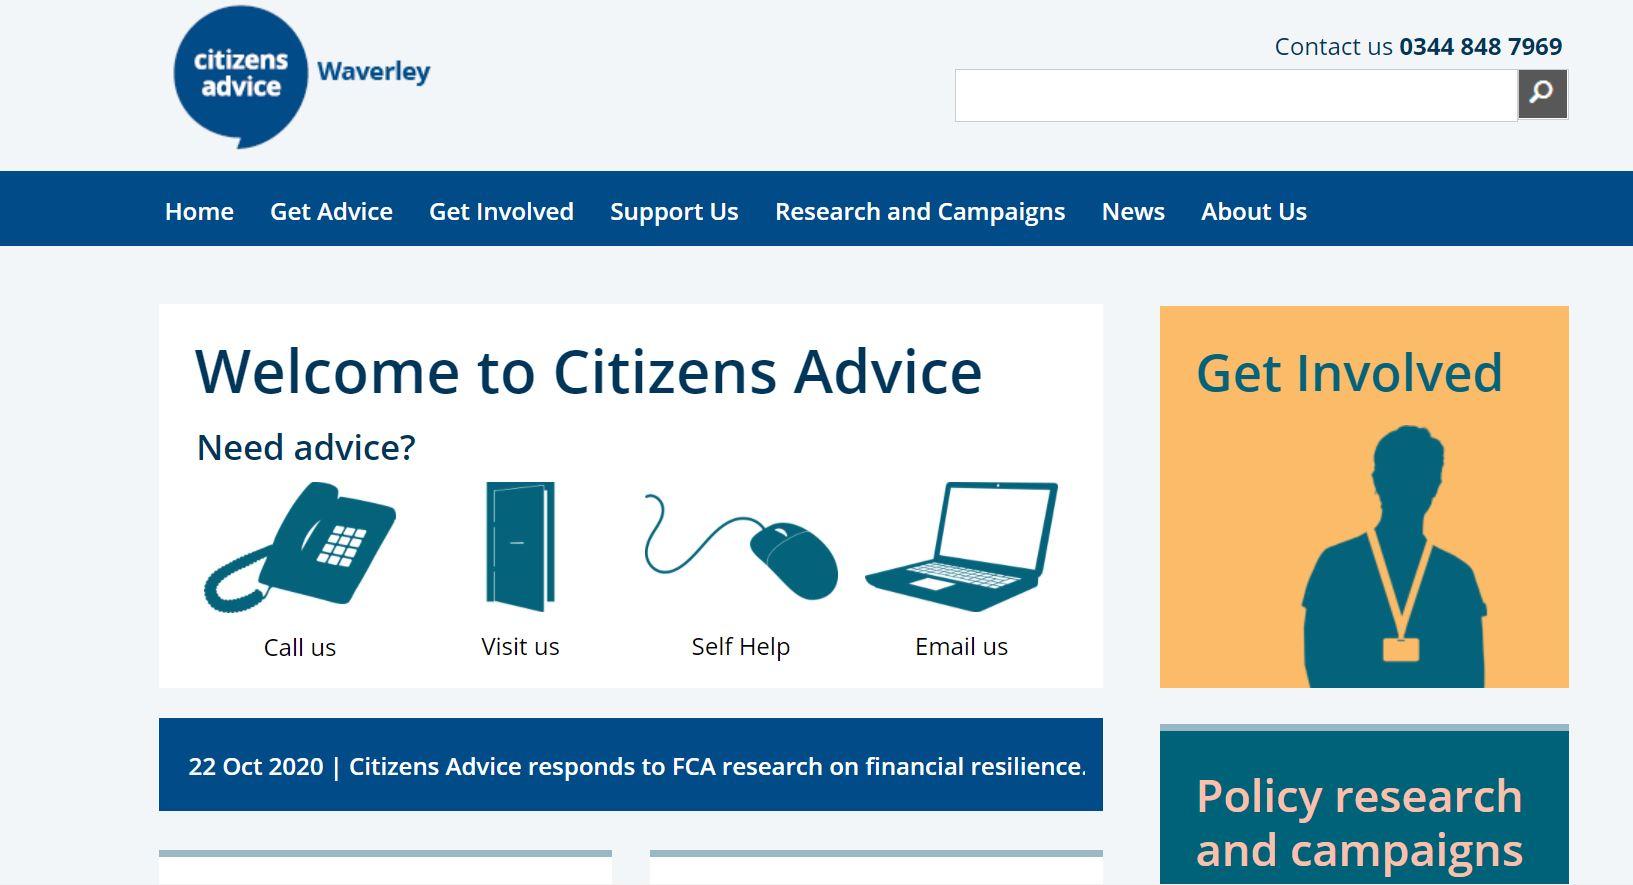 Citizens Advice Waverley